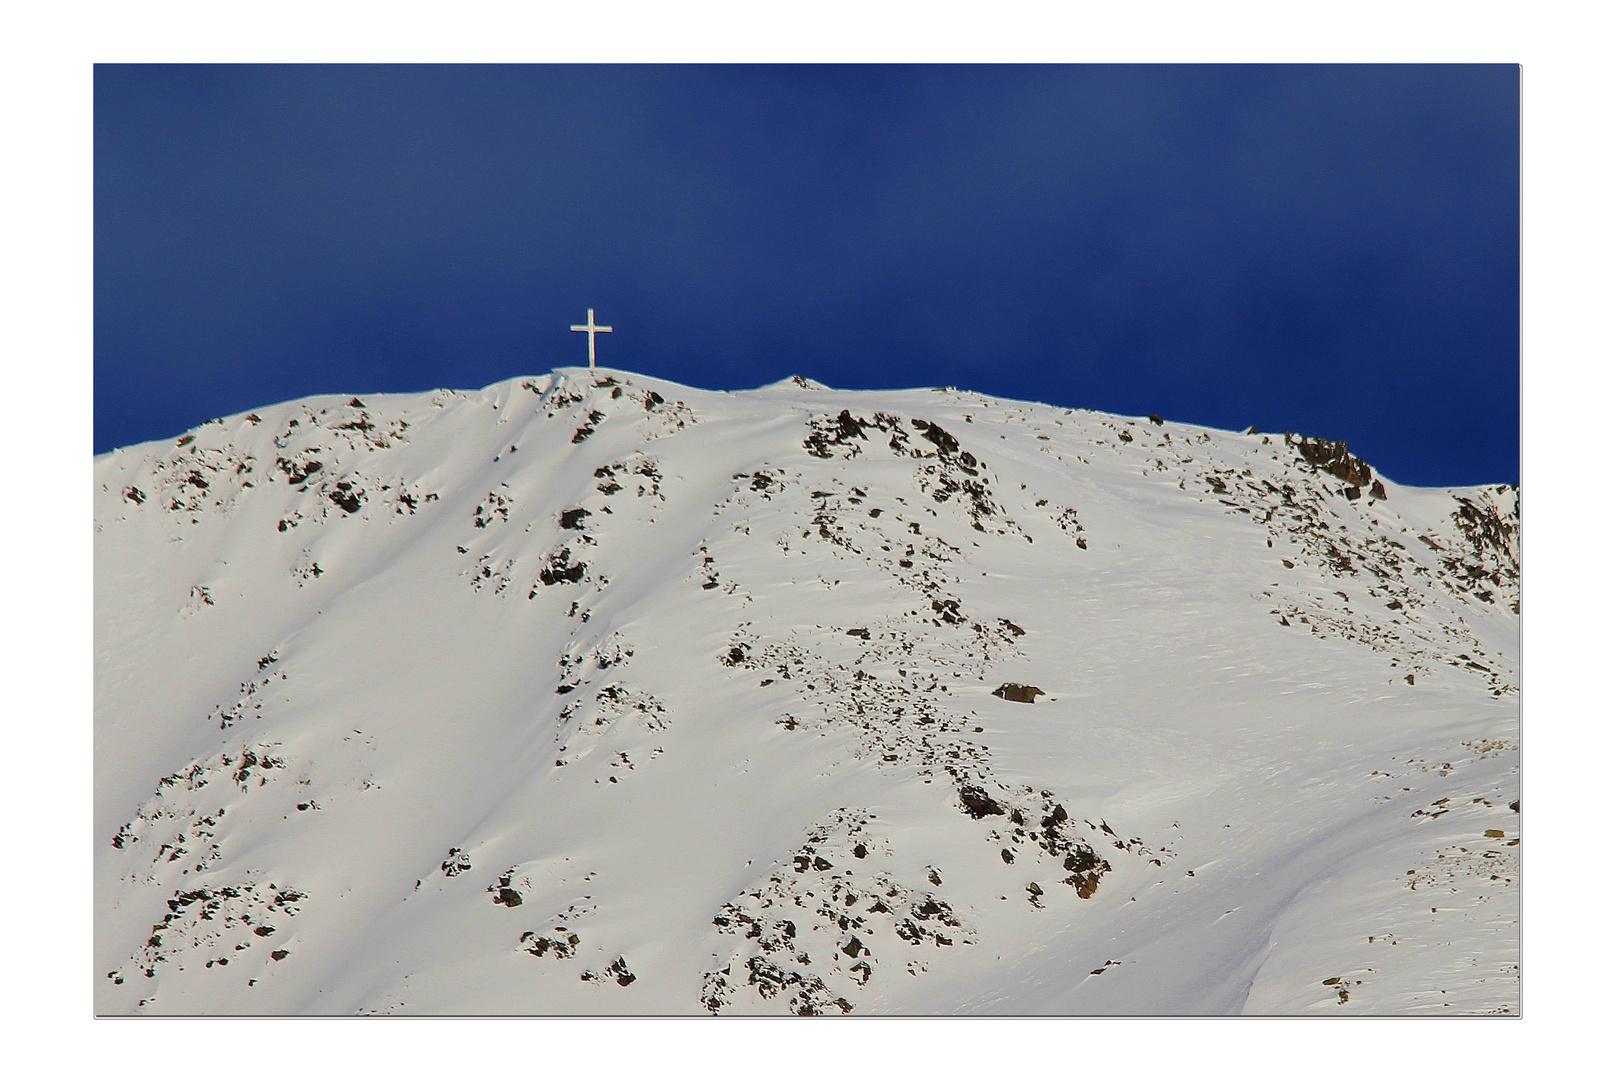 Gipfelkreuz vom Rossbodenstock...(Part 2)